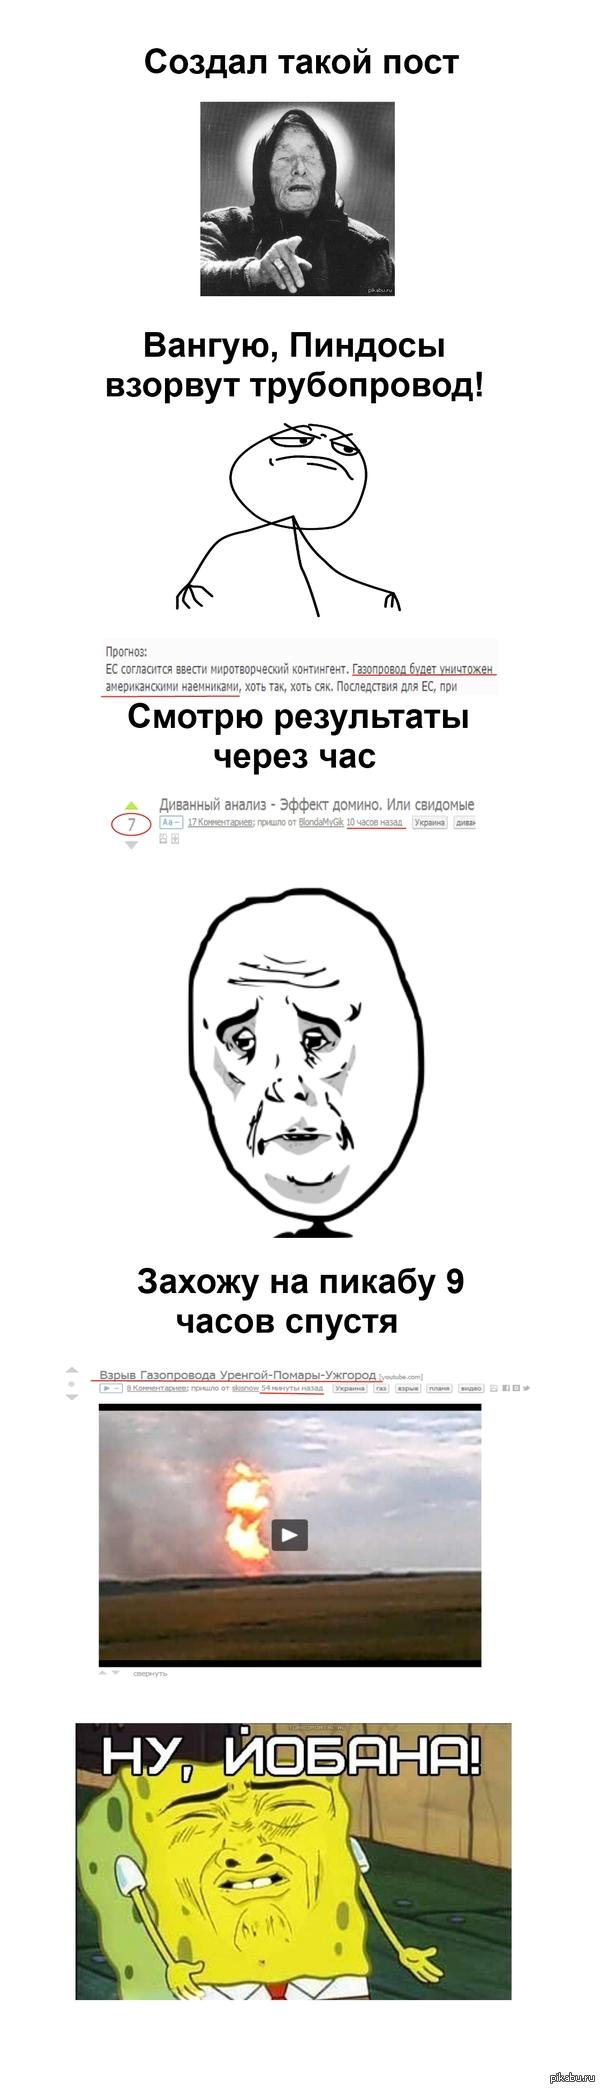 "Ад кармодрочера Пост будет атакован ДВУ - пруф <a href=""http://pikabu.ru/story/divannyiy_analiz__yeffekt_domino_ili_svidomyie_na_pikabu_zadrali_2389674"">http://pikabu.ru/story/_2389674</a>"